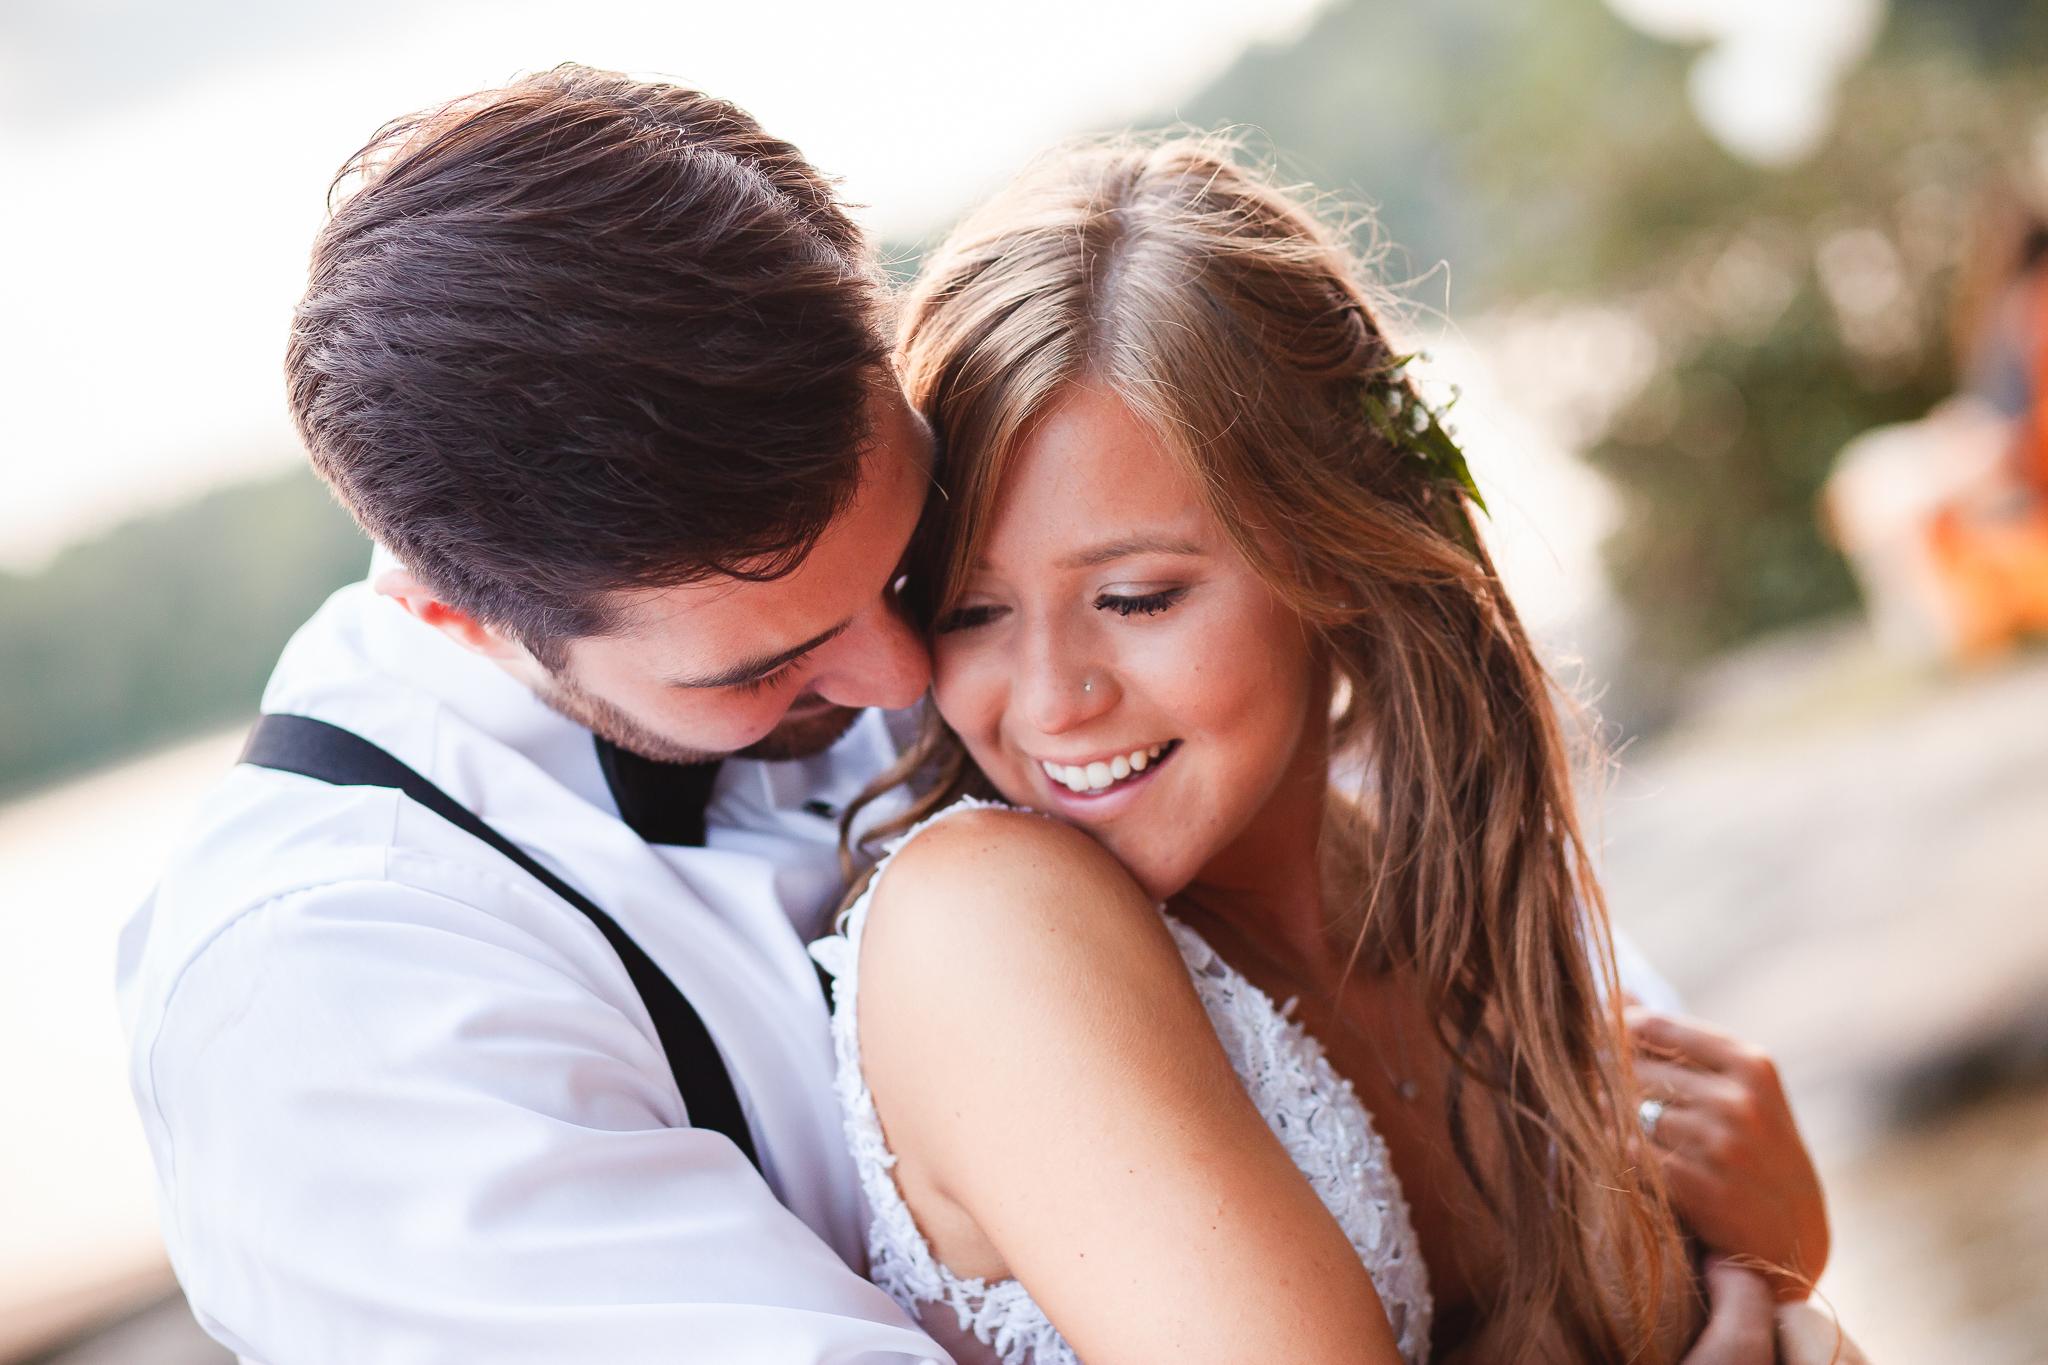 Amy D Photography- Bride and Groom- Wedding Poses- Muskoka Wedding- Barrie Wedding Photographer- Best Wedding Photographer- Muskoka Wedding Photography- Bride Pose- Groom Pose-91.jpg